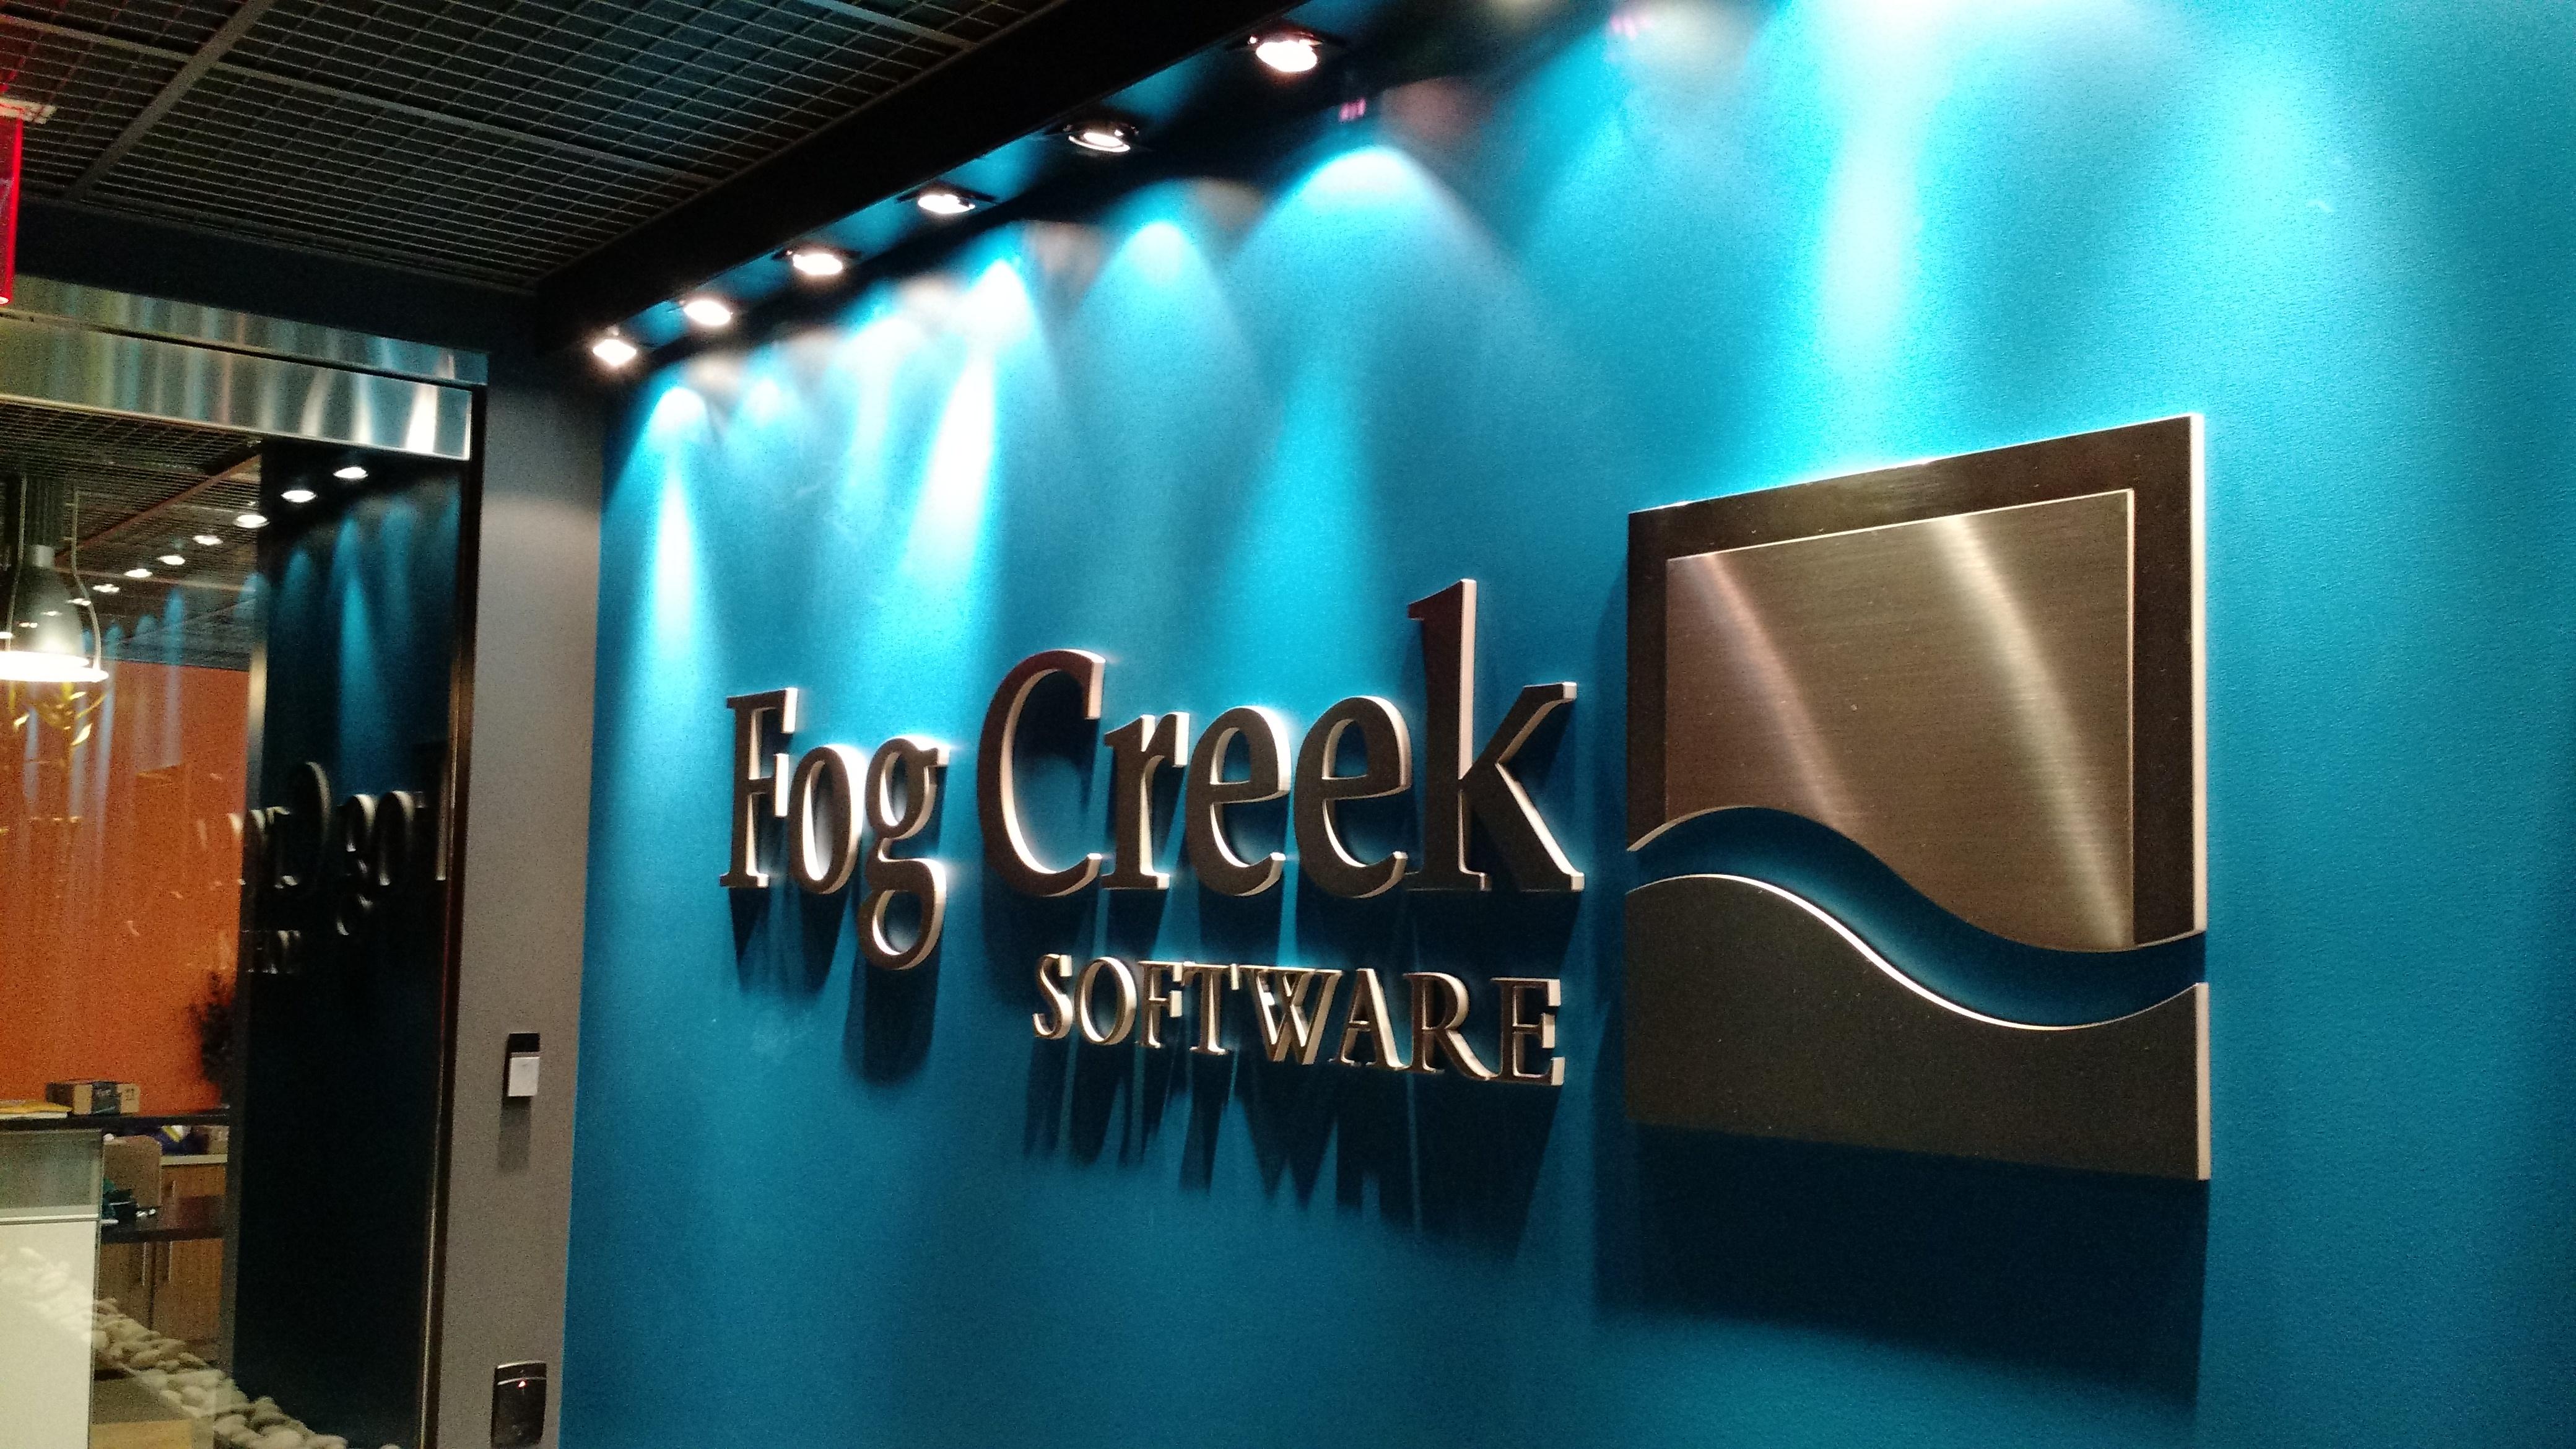 Fog Creek Software headquarters in New York.